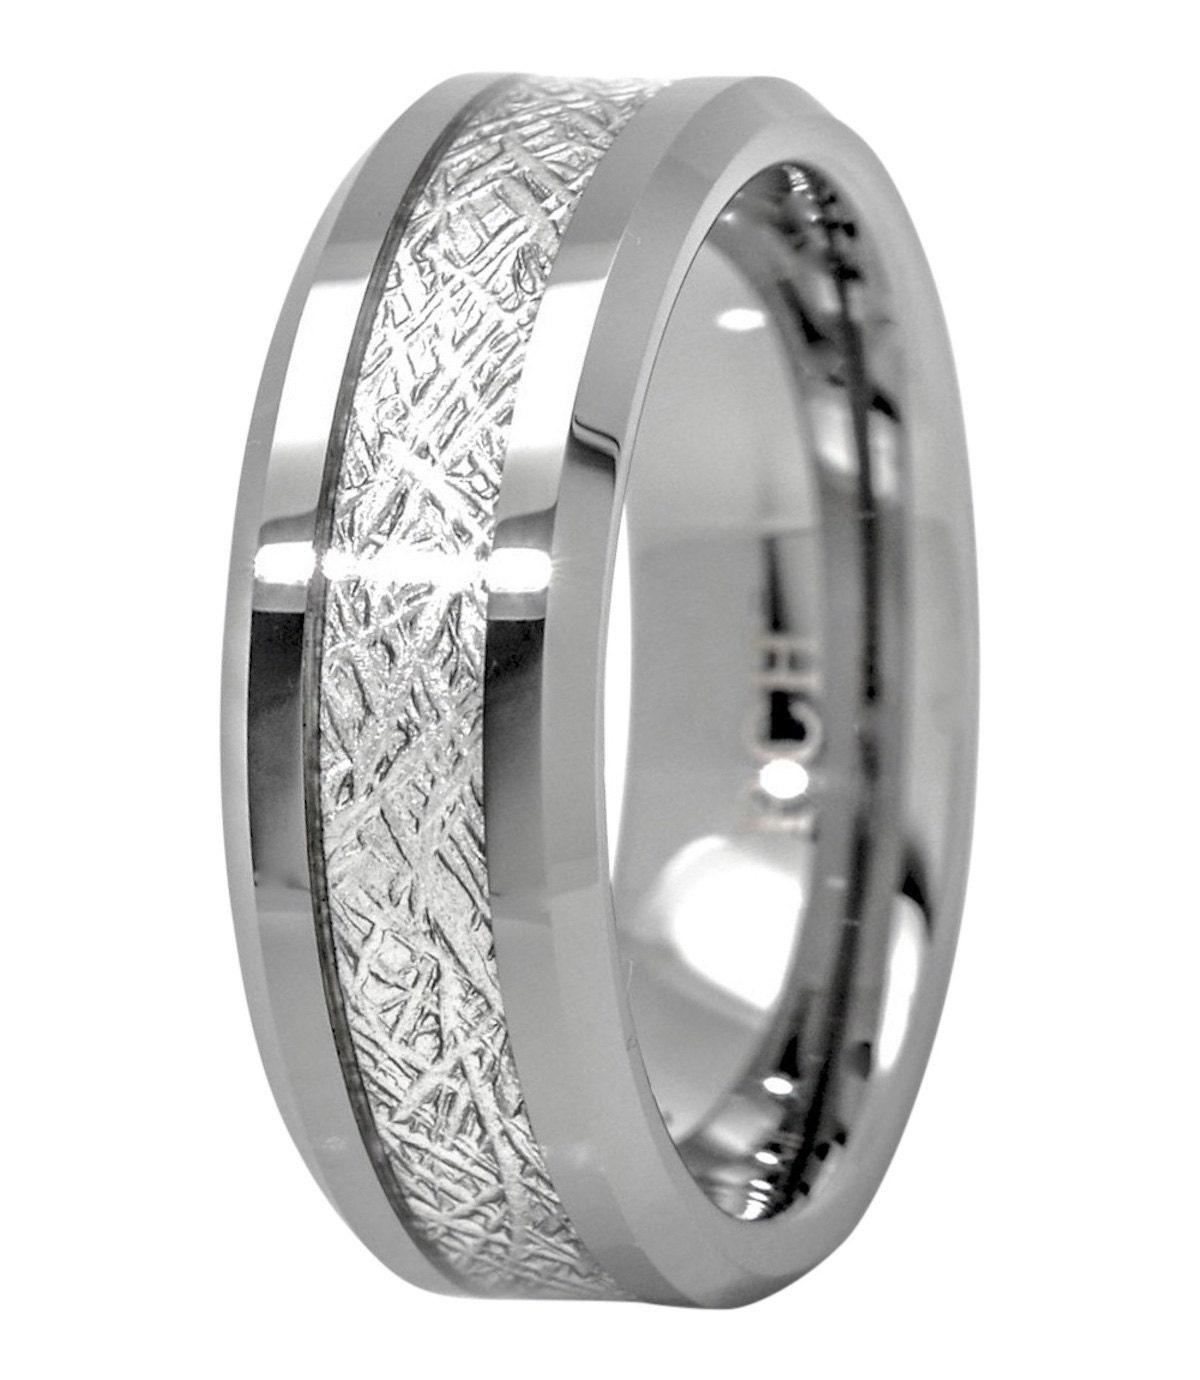 Meteorite Ring Tungsten Carbide For Men 8mm Comfort Fit